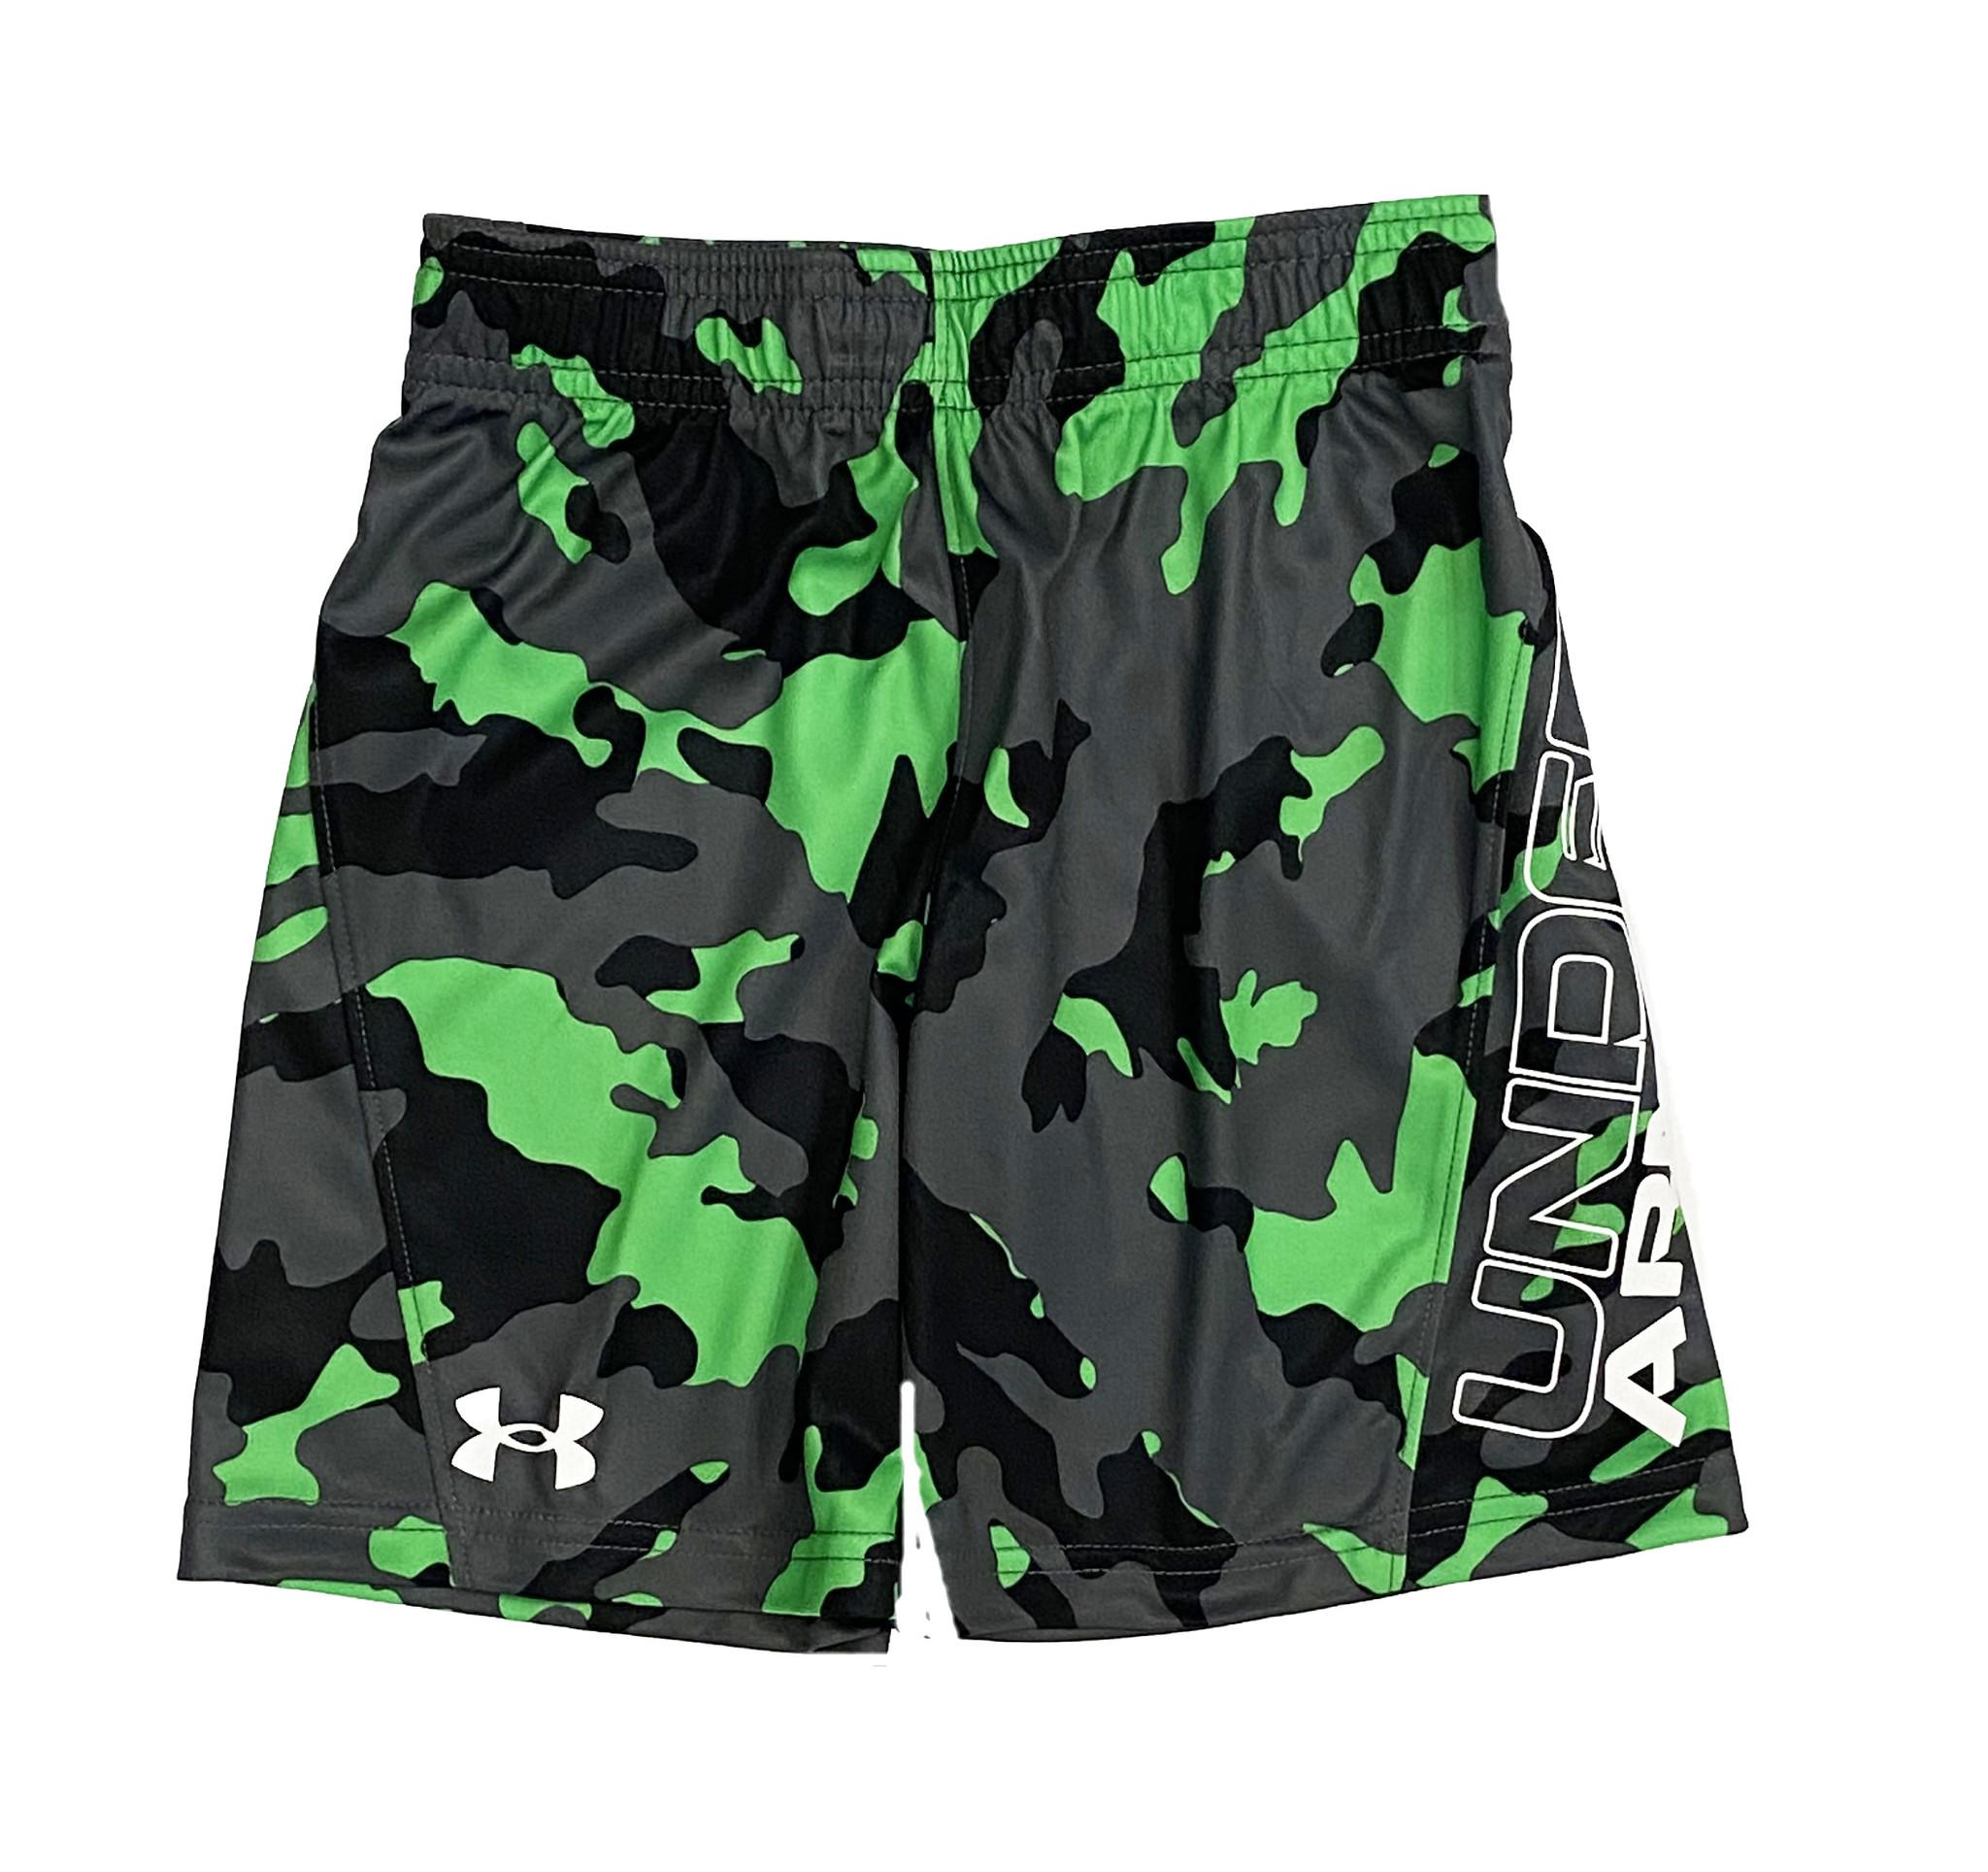 Under Armour Laser Green Shorts